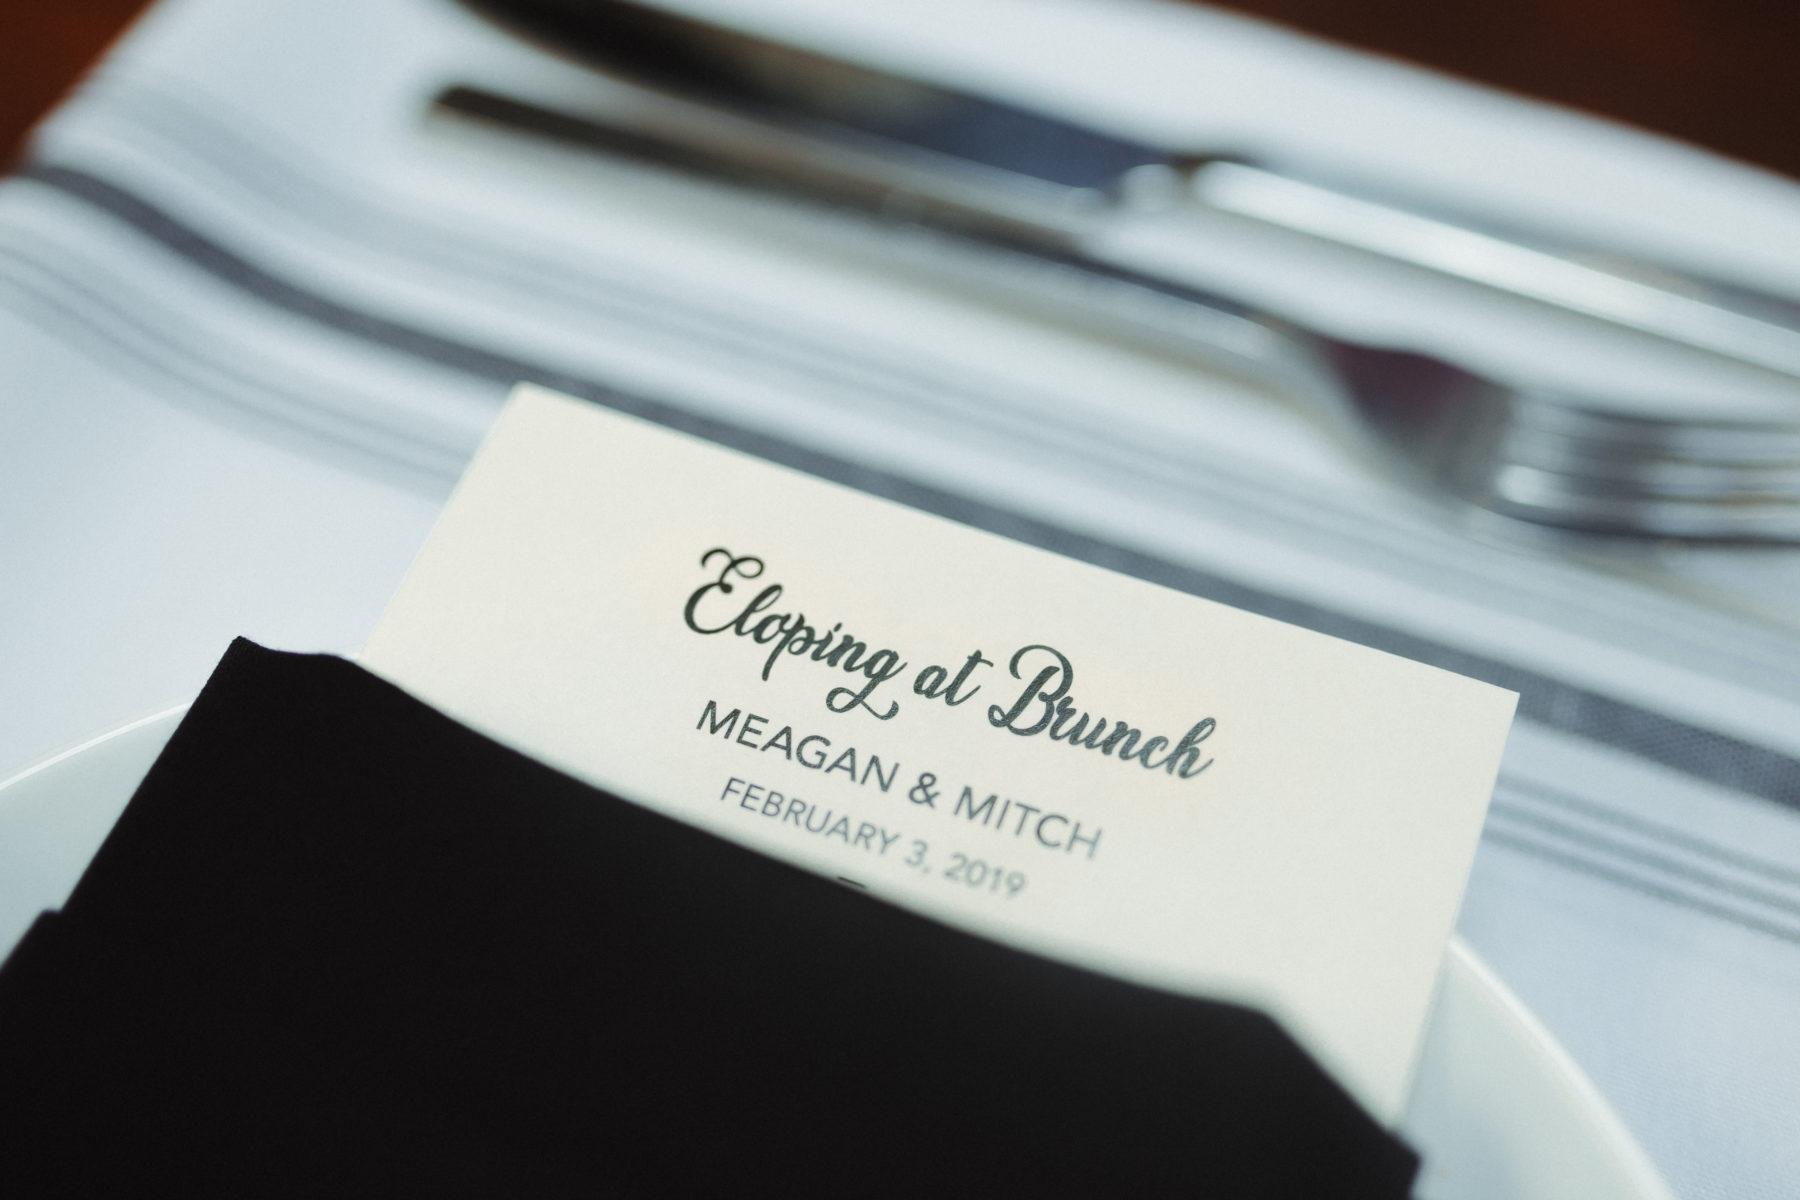 Wedding menu design: Nashville brunch elopement featured on Nashville Bride Guide